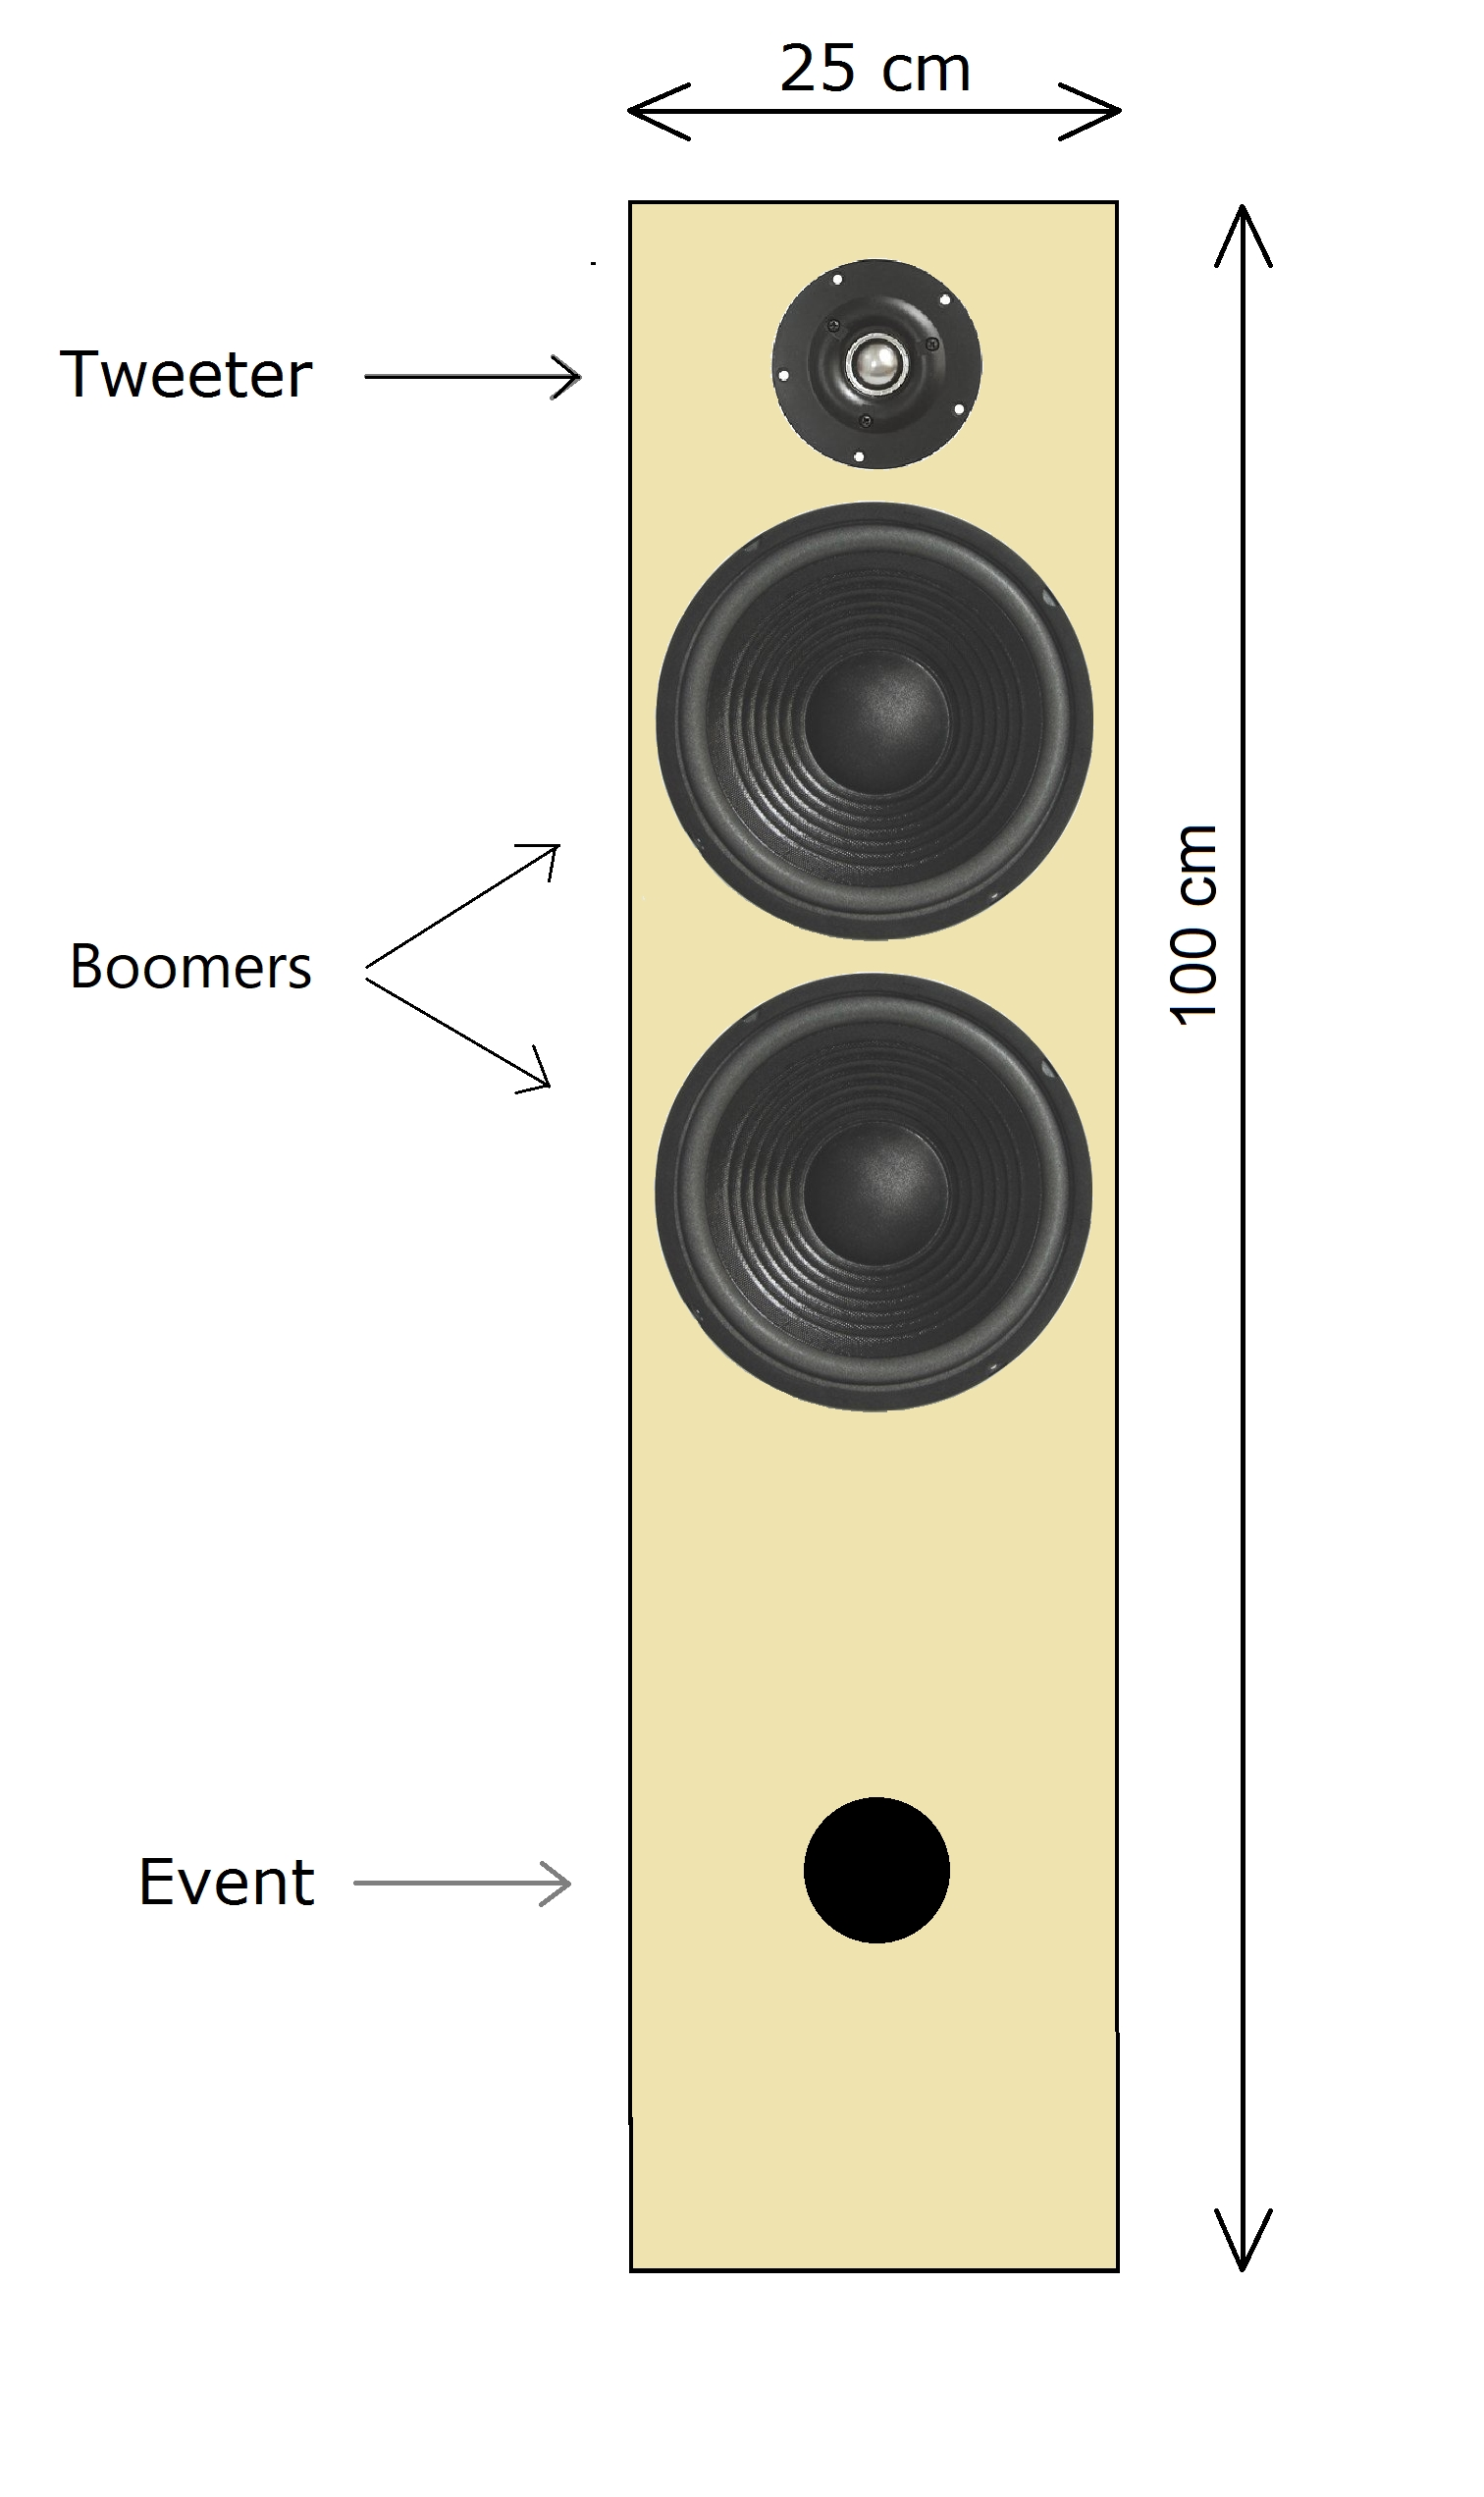 Enceinte double boomer 20 cm JPEG simple